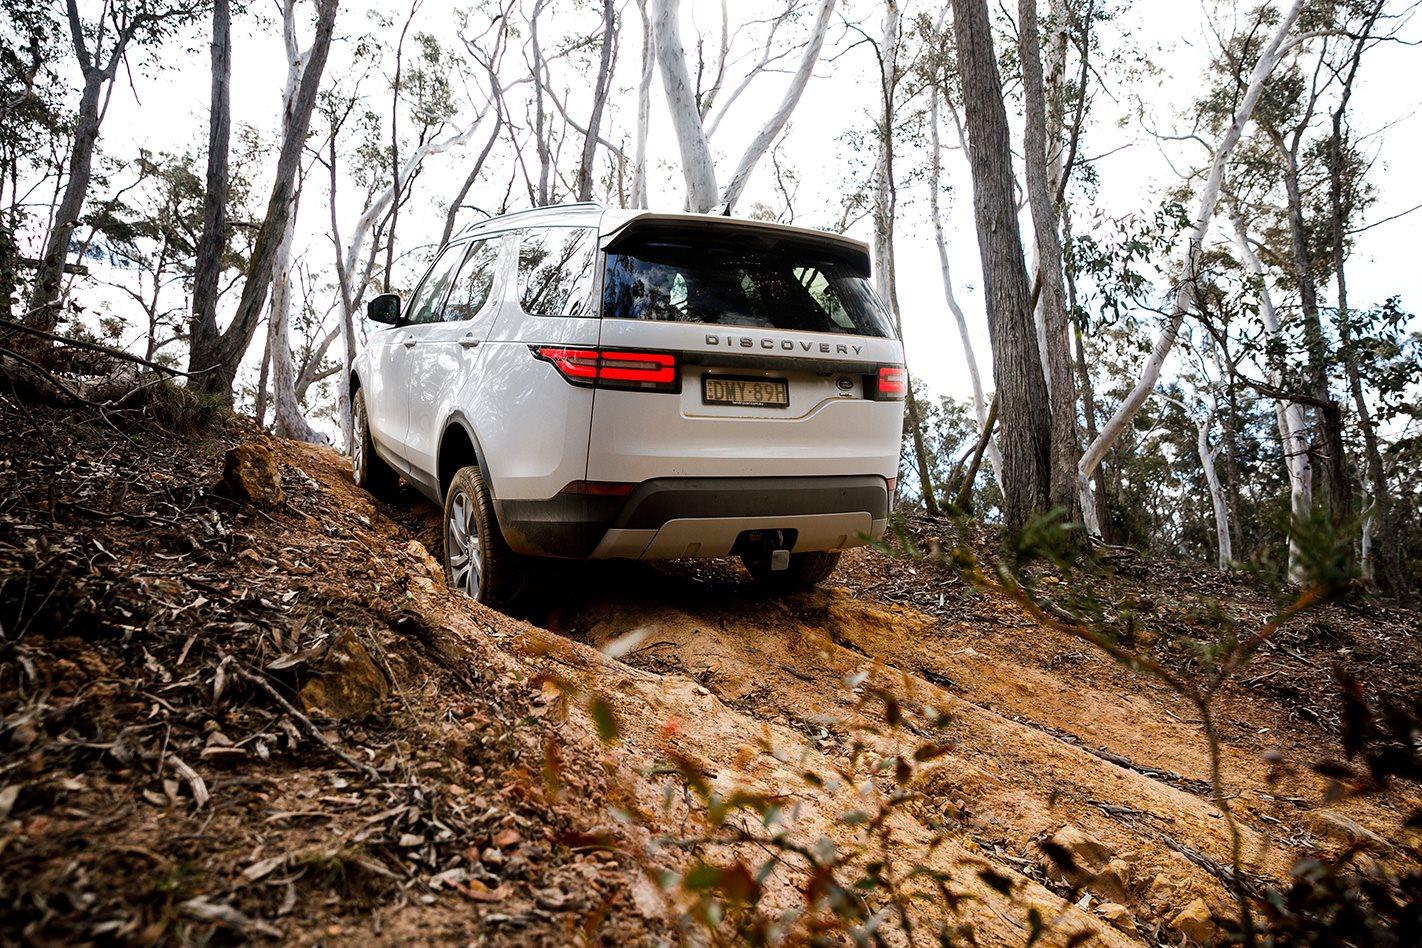 2017 Land Rover Discovery V Toyota 200 Series Prado Electric Brake Controller Australian Owners Rocky Terrain